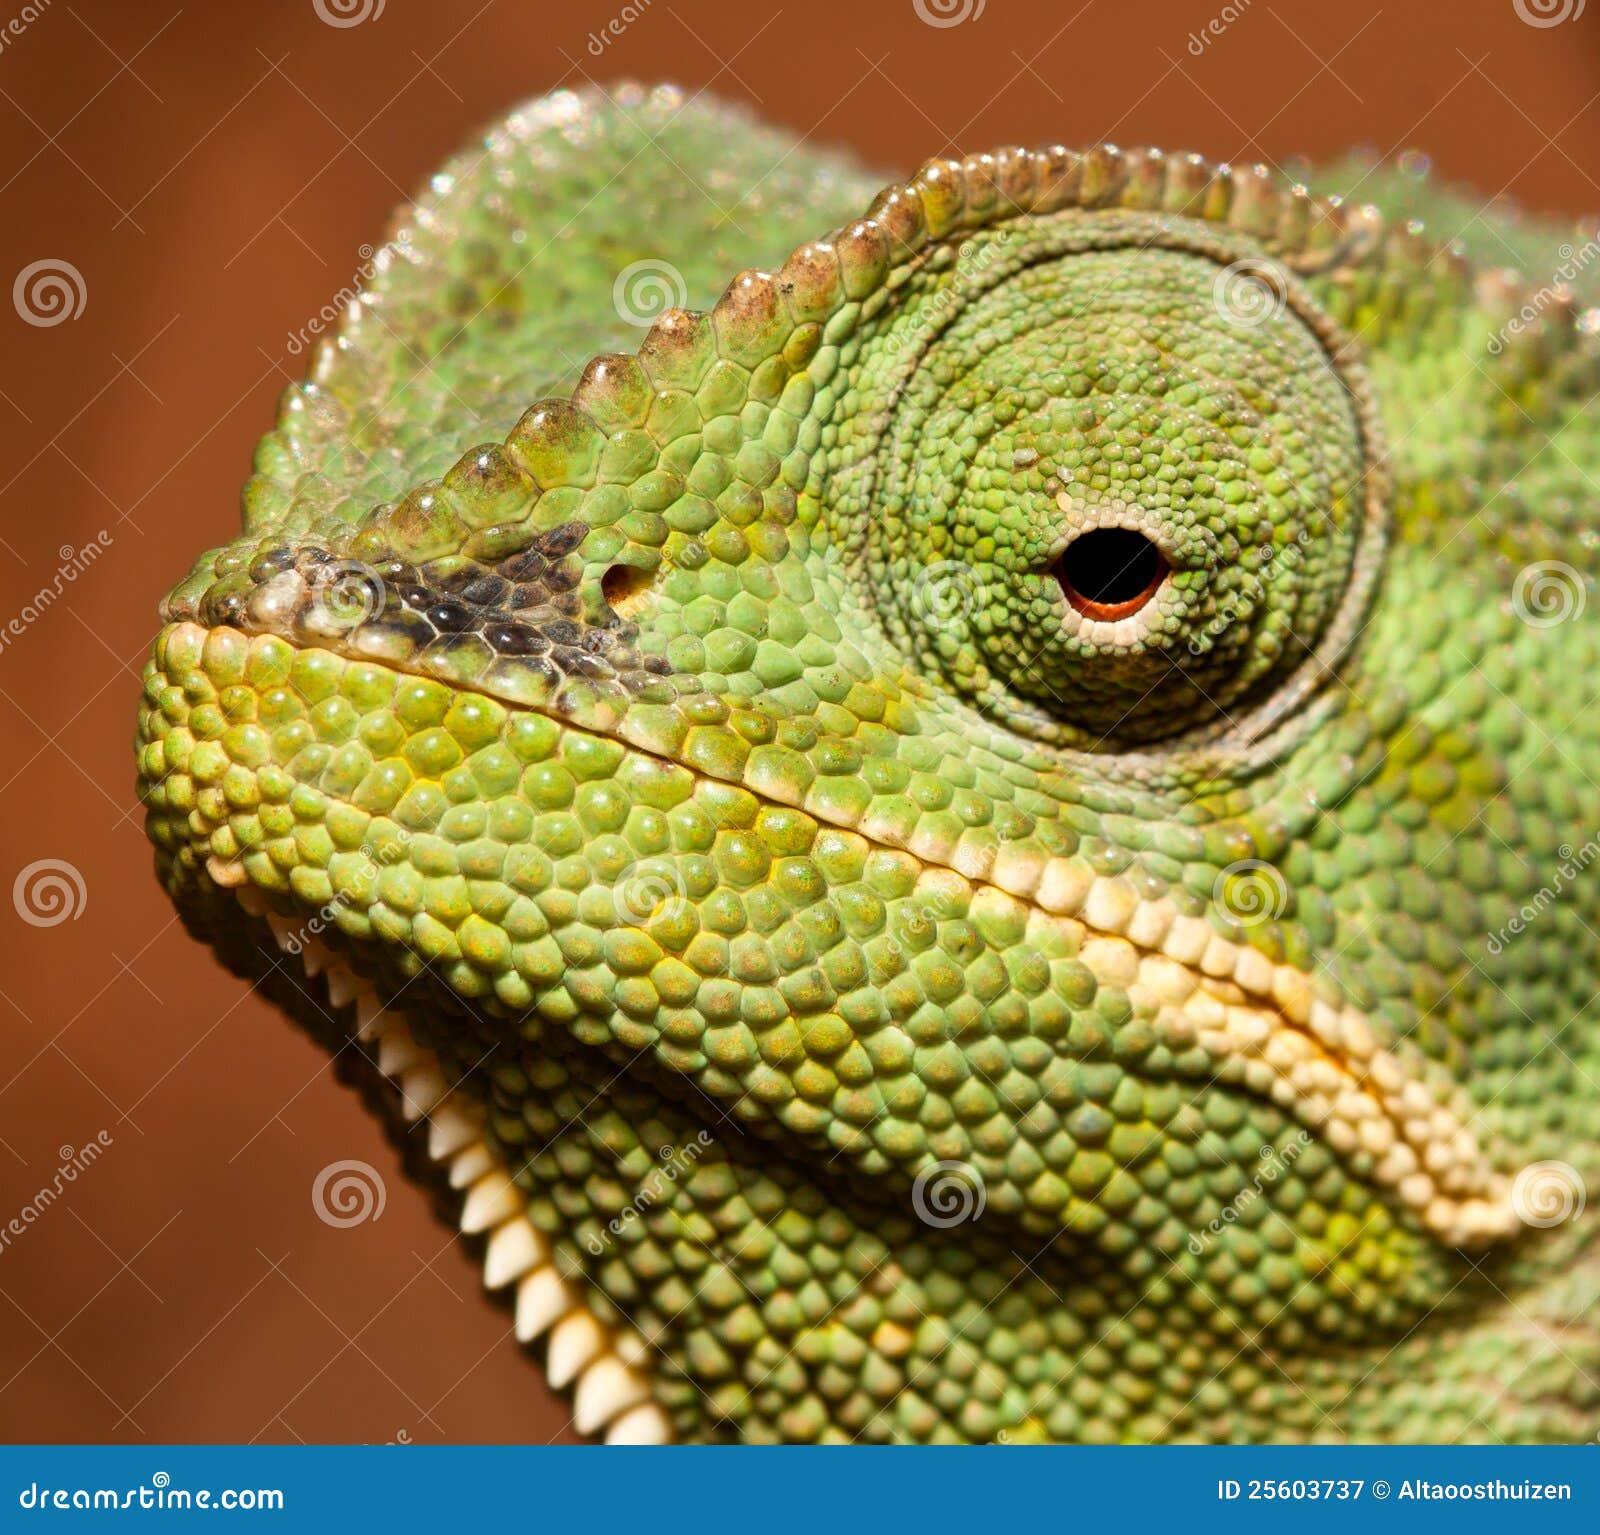 Macro Of Green Cameleon Royalty Free Stock Photography